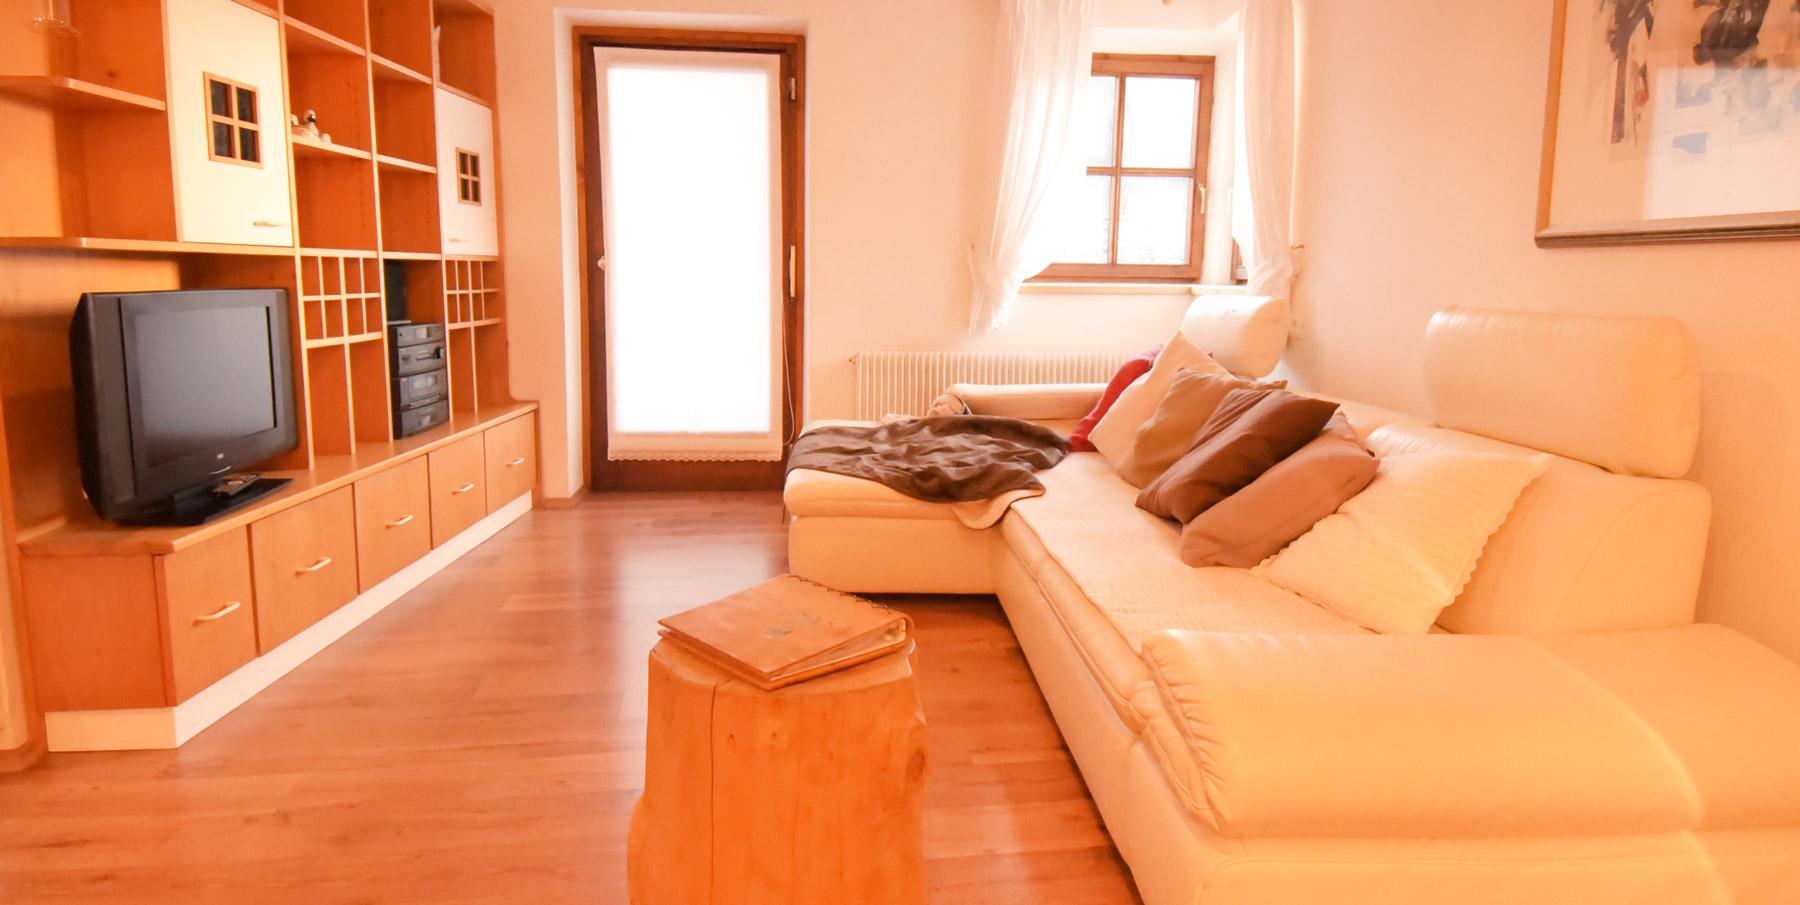 sonnenblume naturoase stegerhof. Black Bedroom Furniture Sets. Home Design Ideas